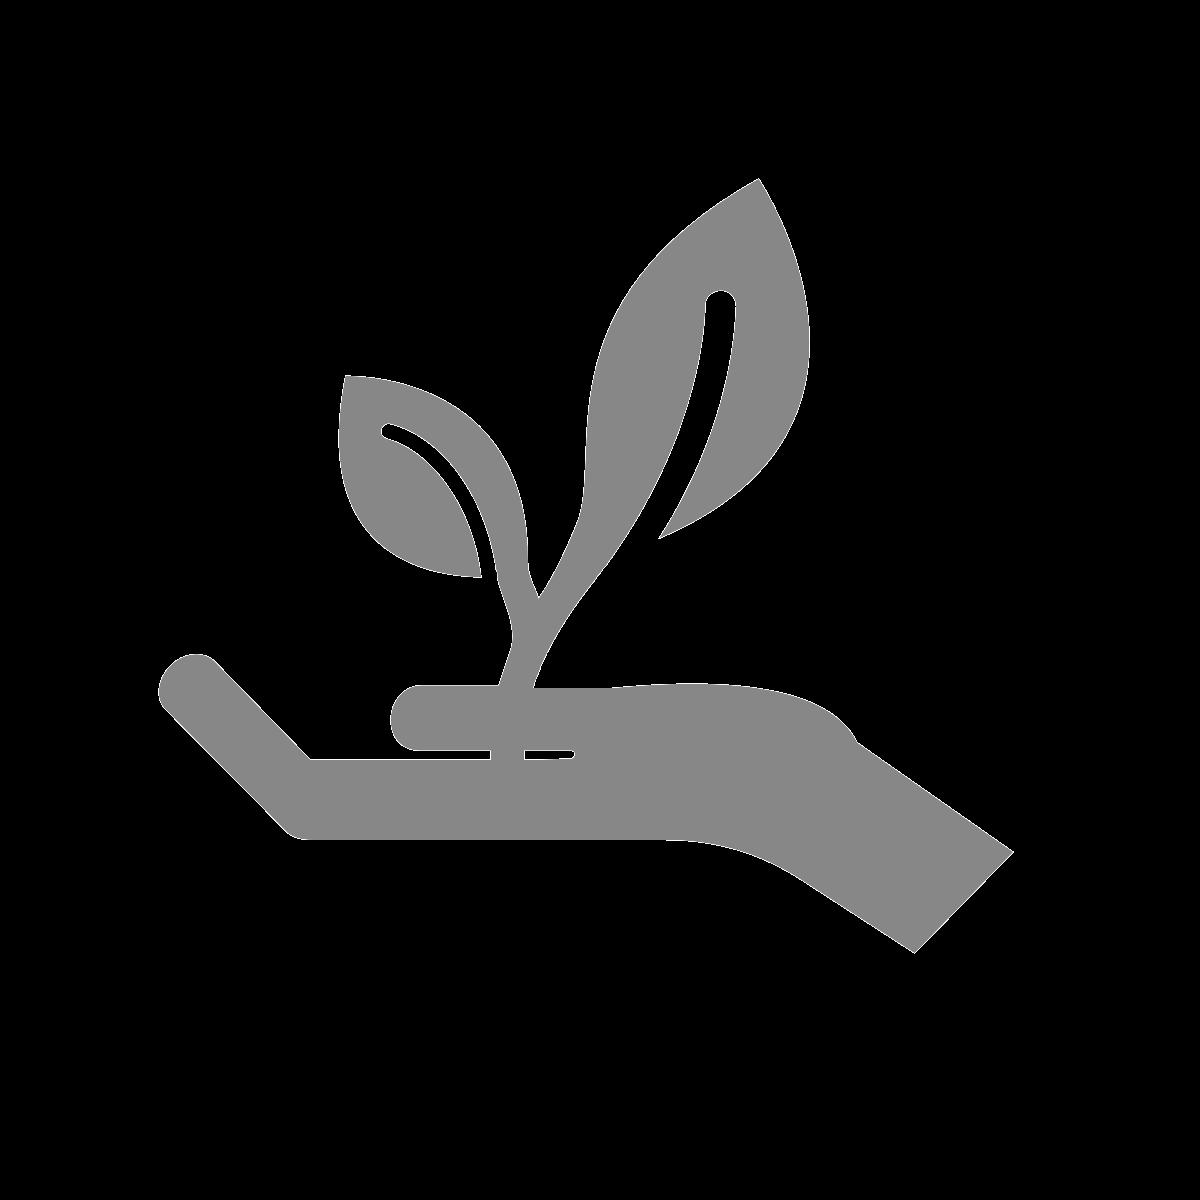 Carbon Analytics creativity social responsibility diversity sustainability